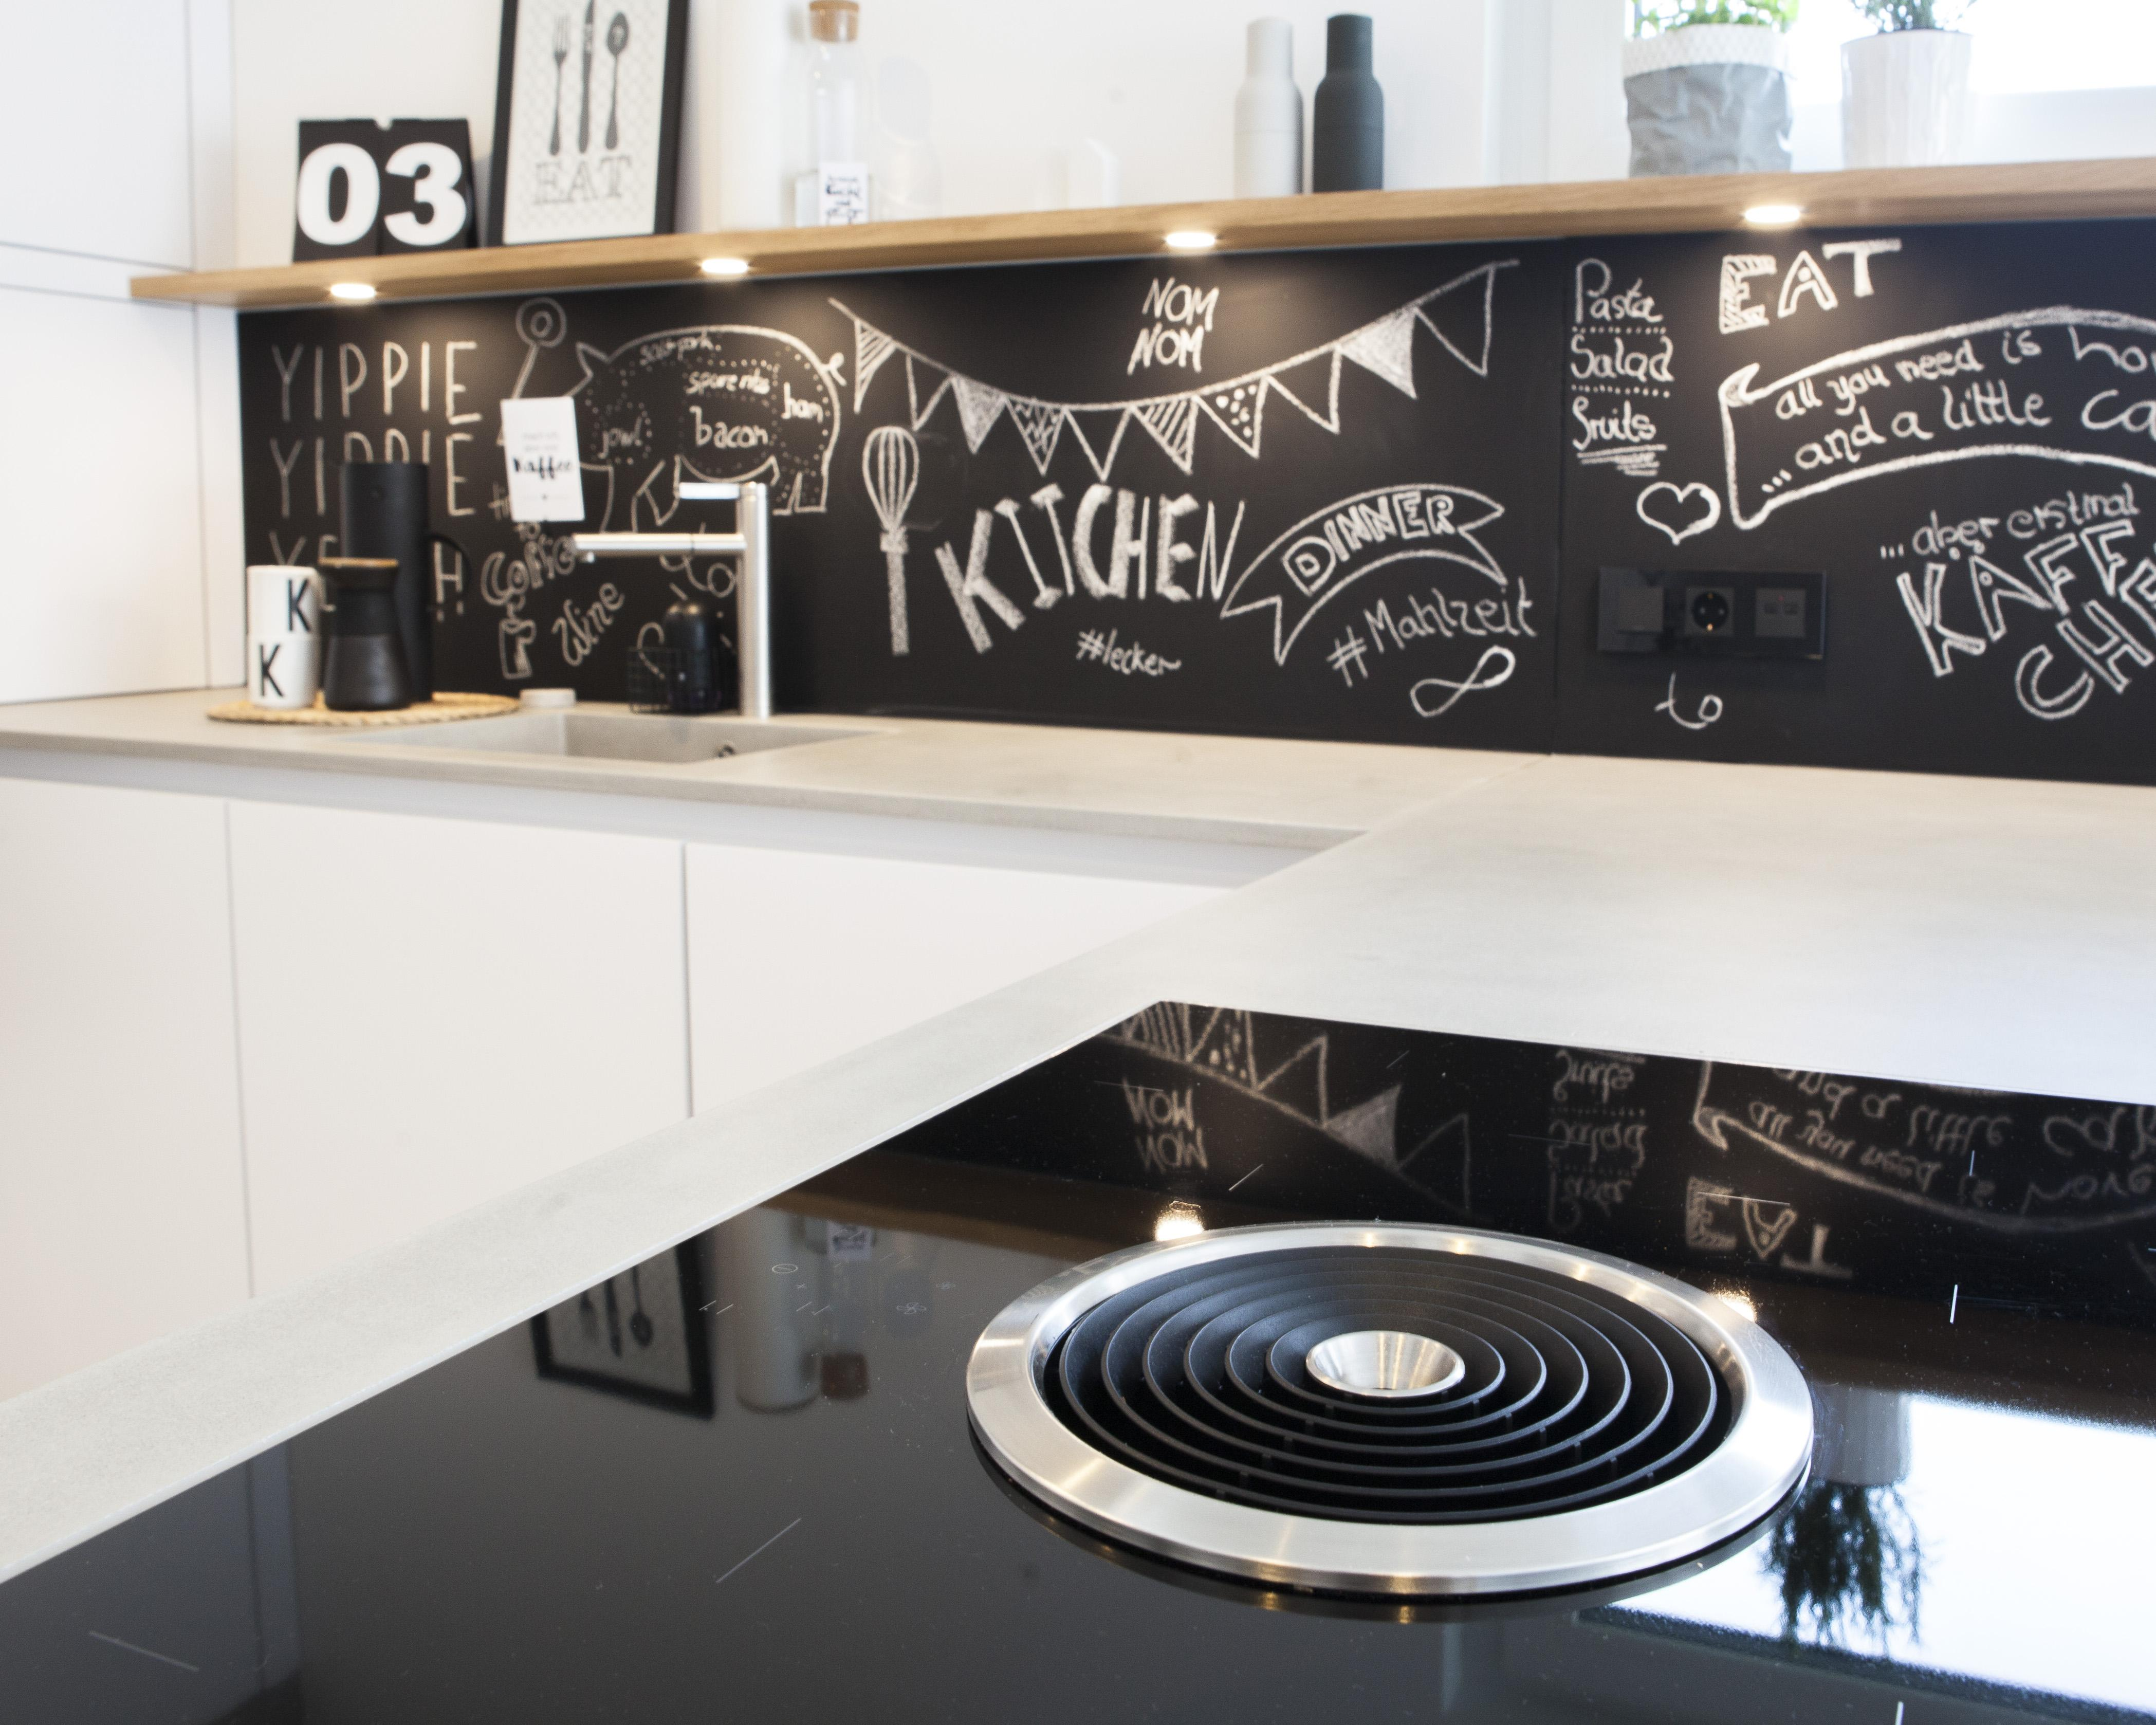 bora induktionskochfeld anzeige l bora induktionskochfeld preis mit abzug dunstabzug basic. Black Bedroom Furniture Sets. Home Design Ideas